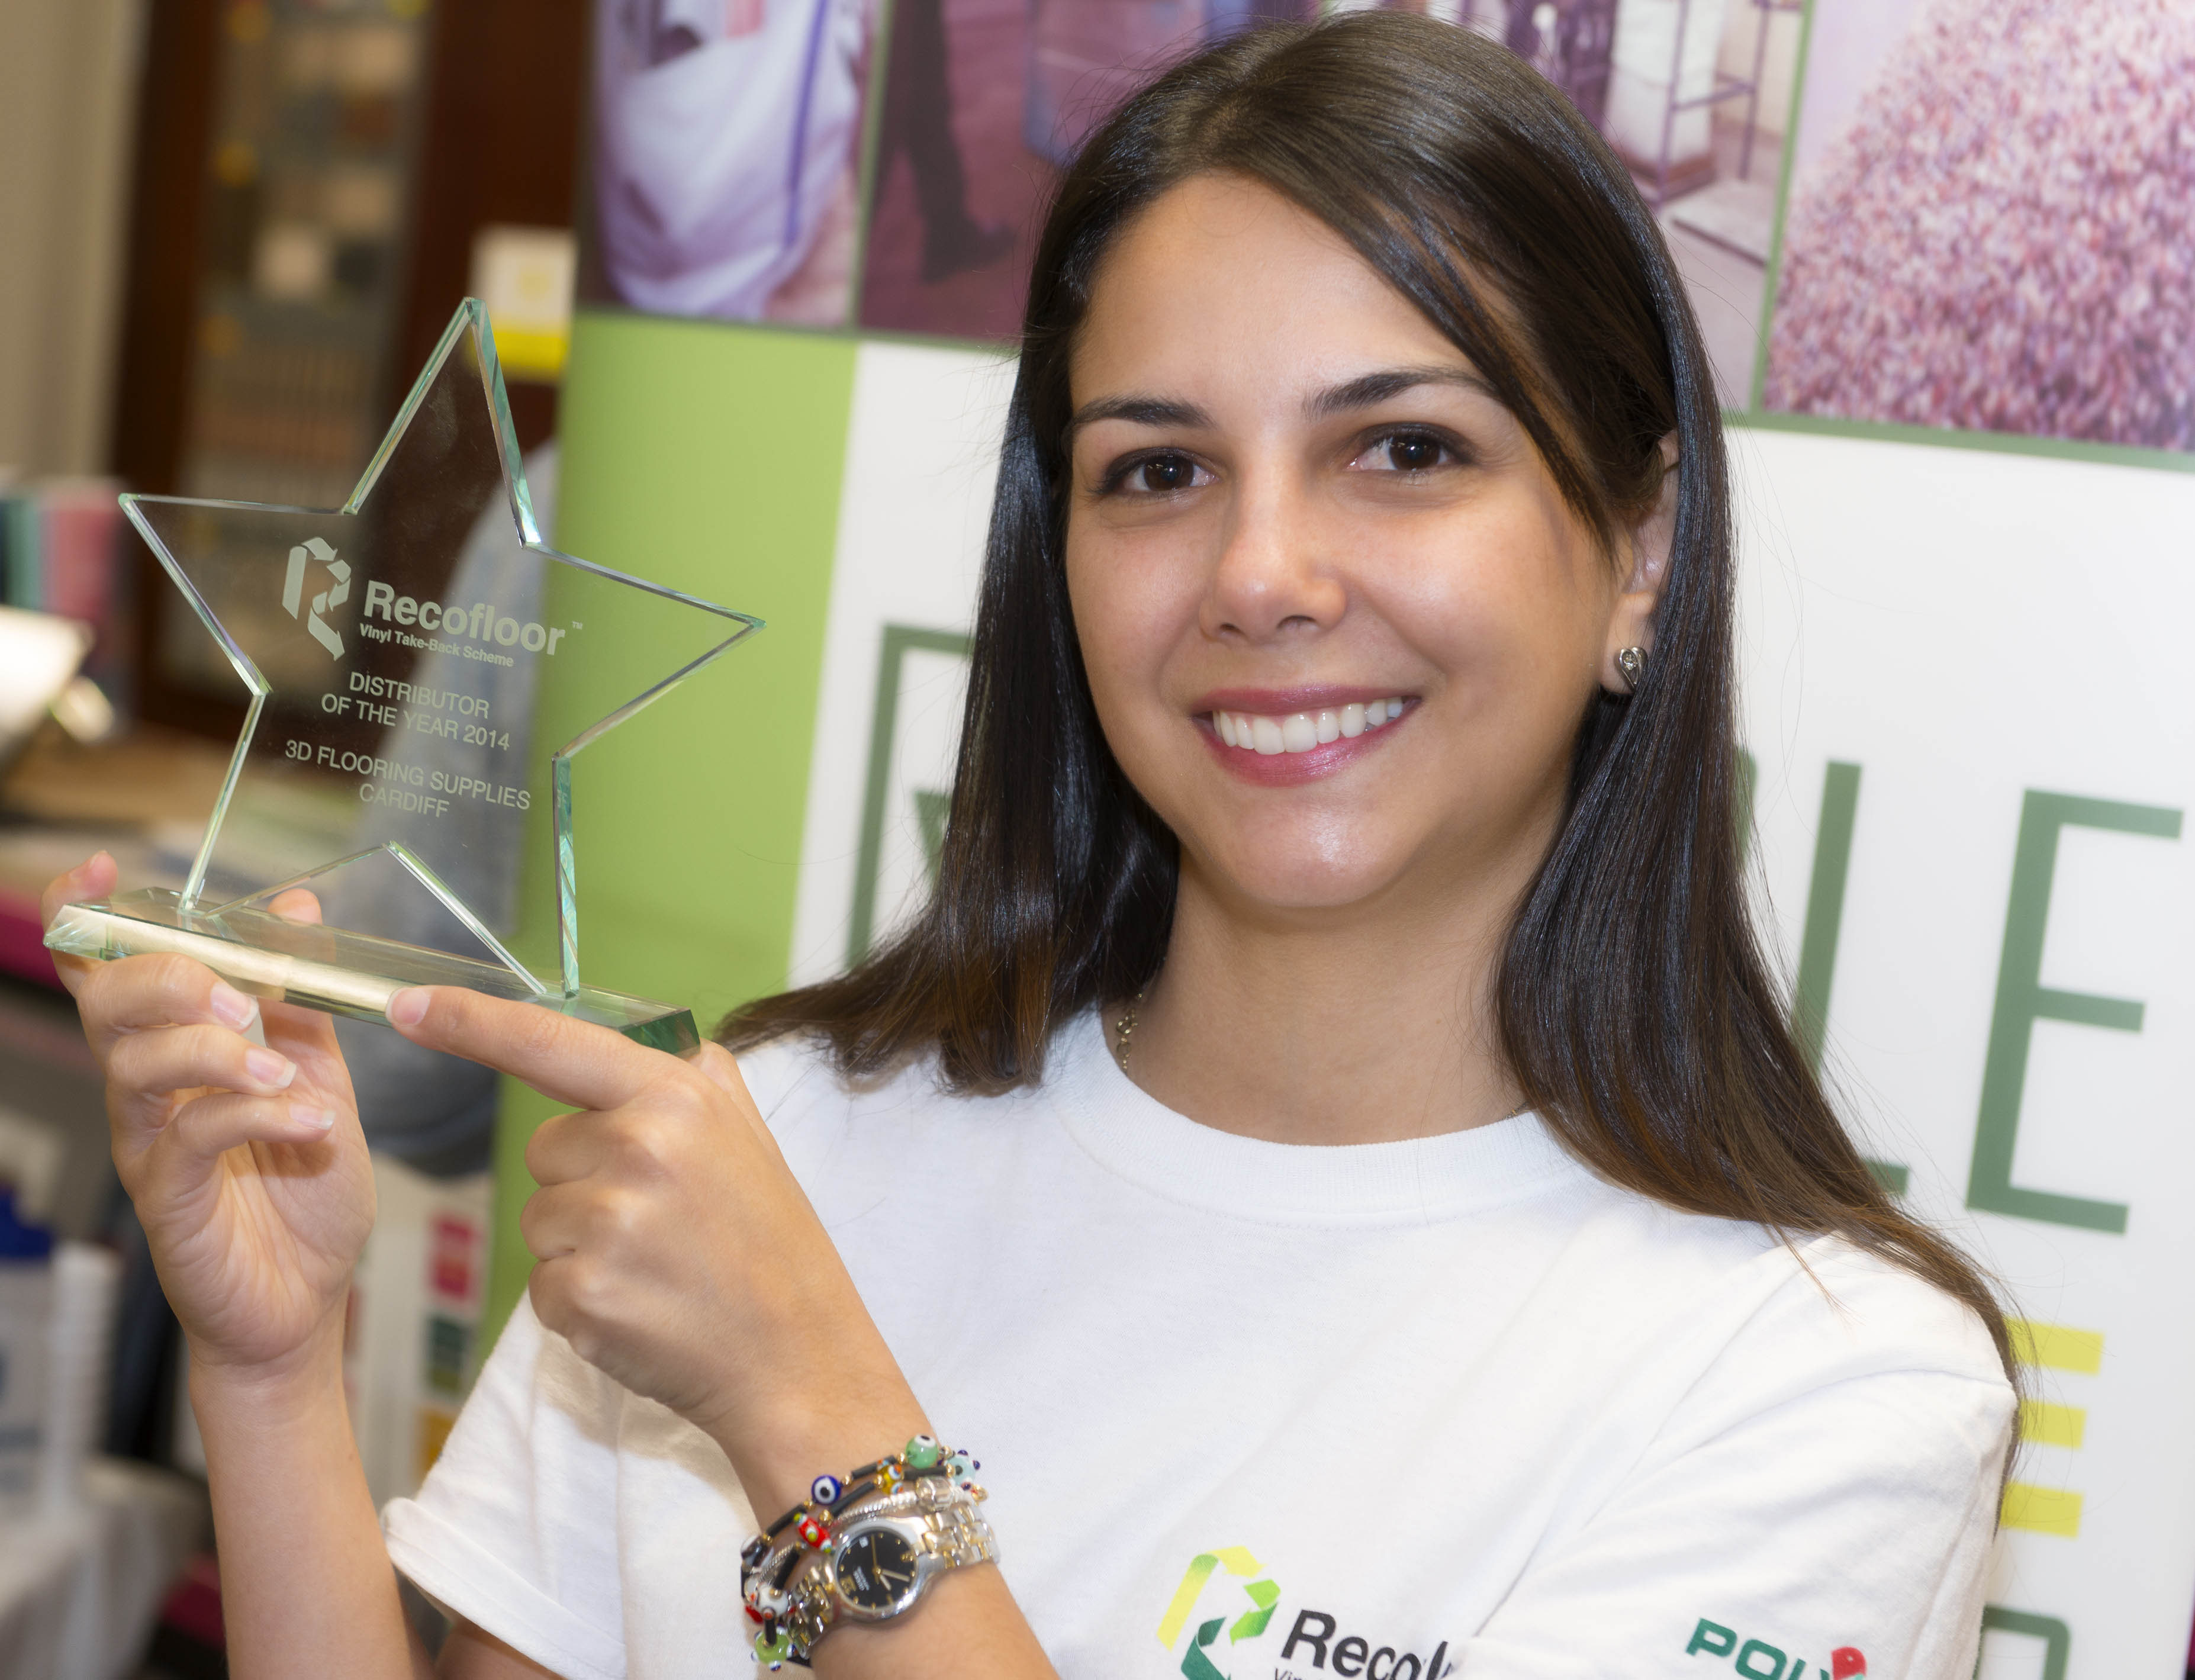 33407_33407_Recofloor-Carla-Eslava-holding-a-Recofloor-Award.jpg